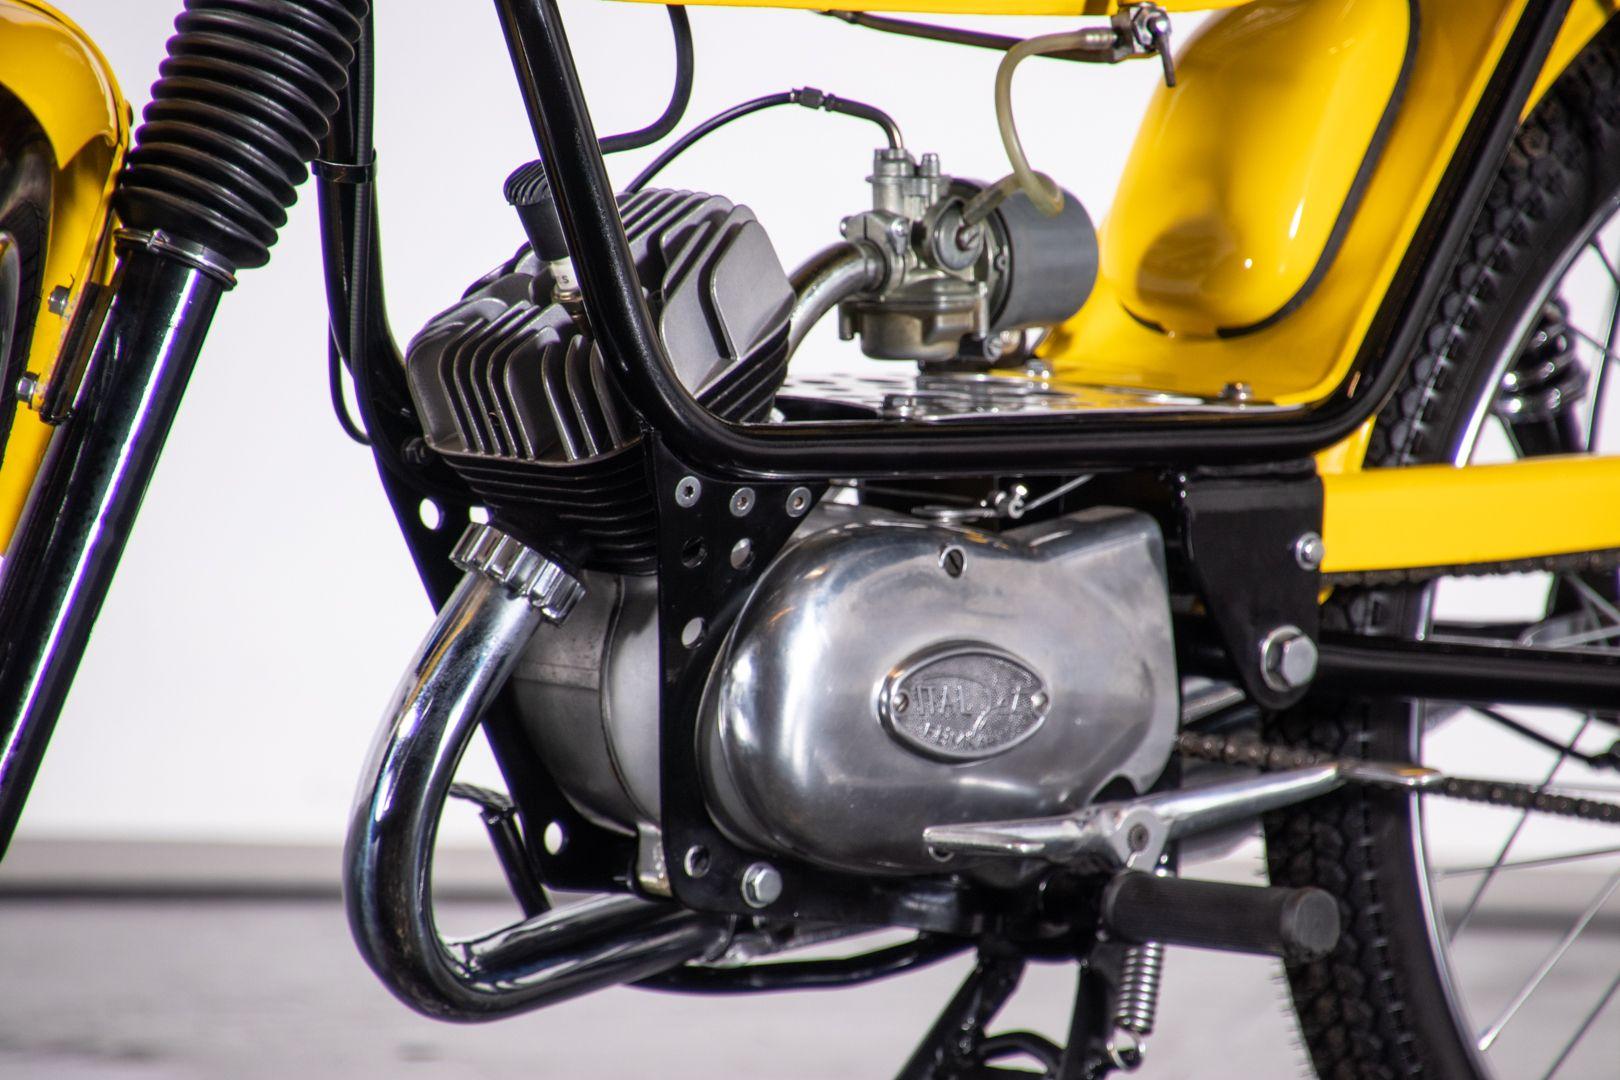 1969 ITALJET 50 CC 52186